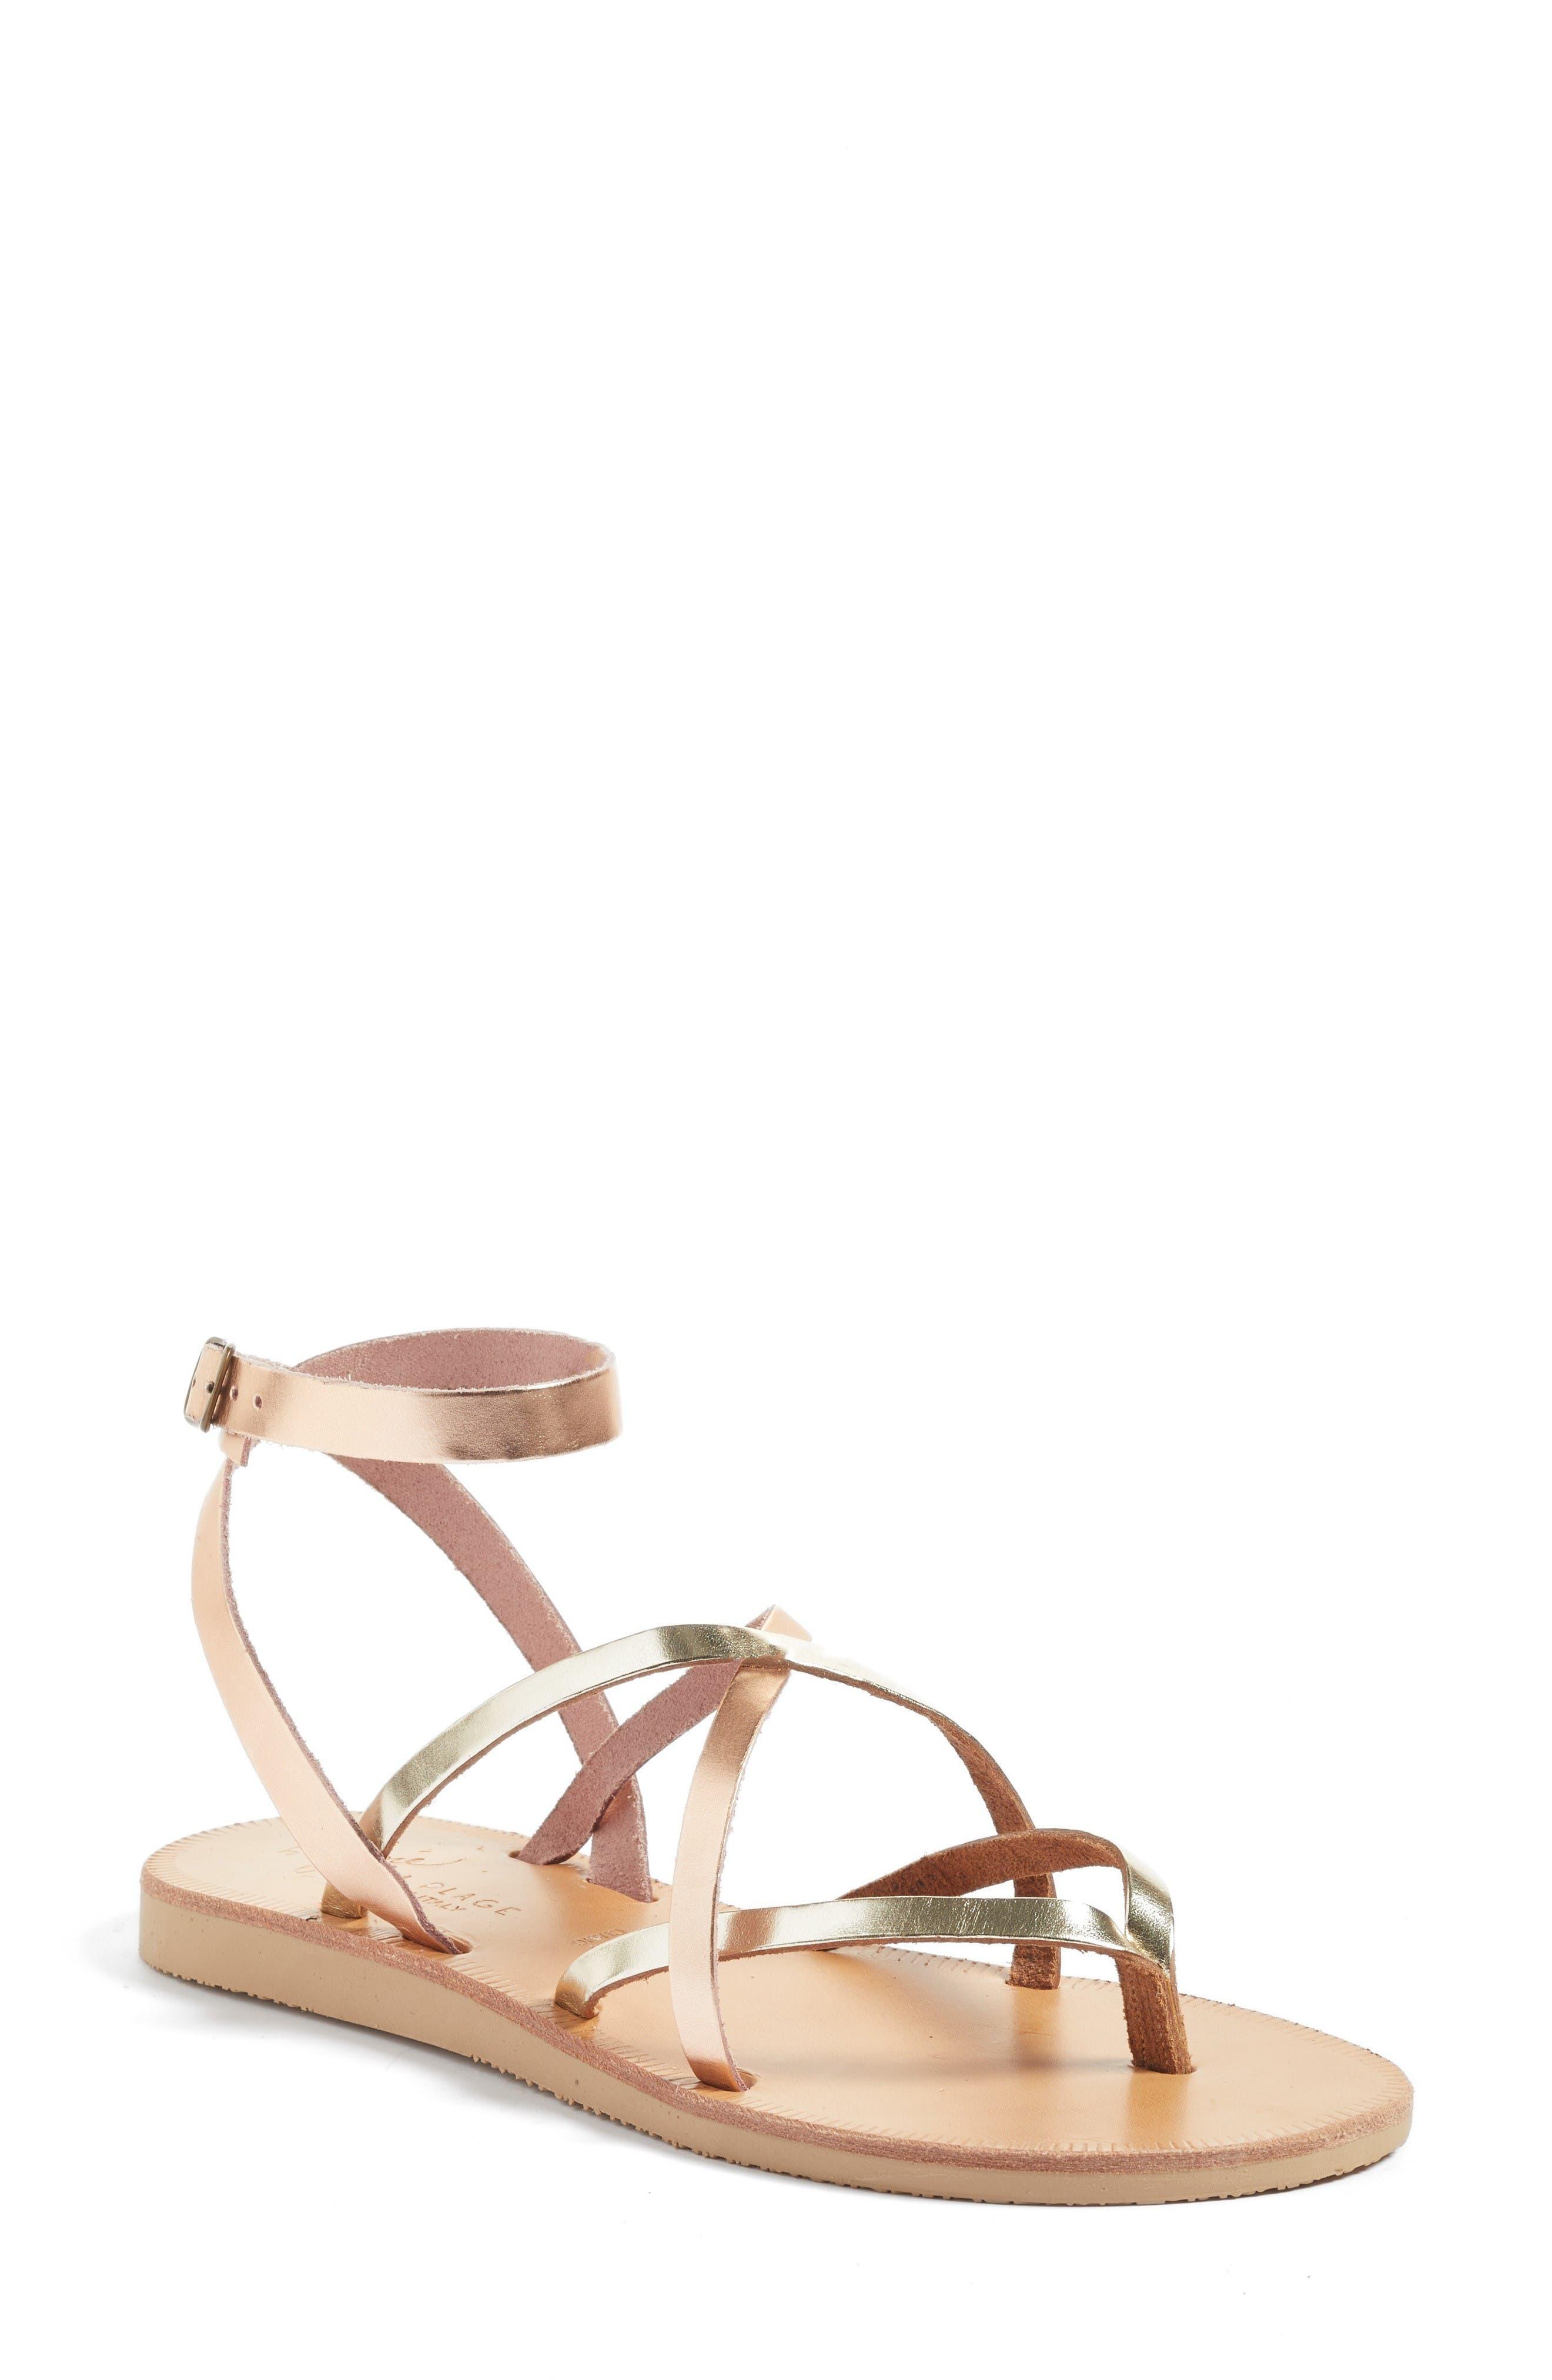 Main Image - Joie 'Oda' Flat Sandal (Women)